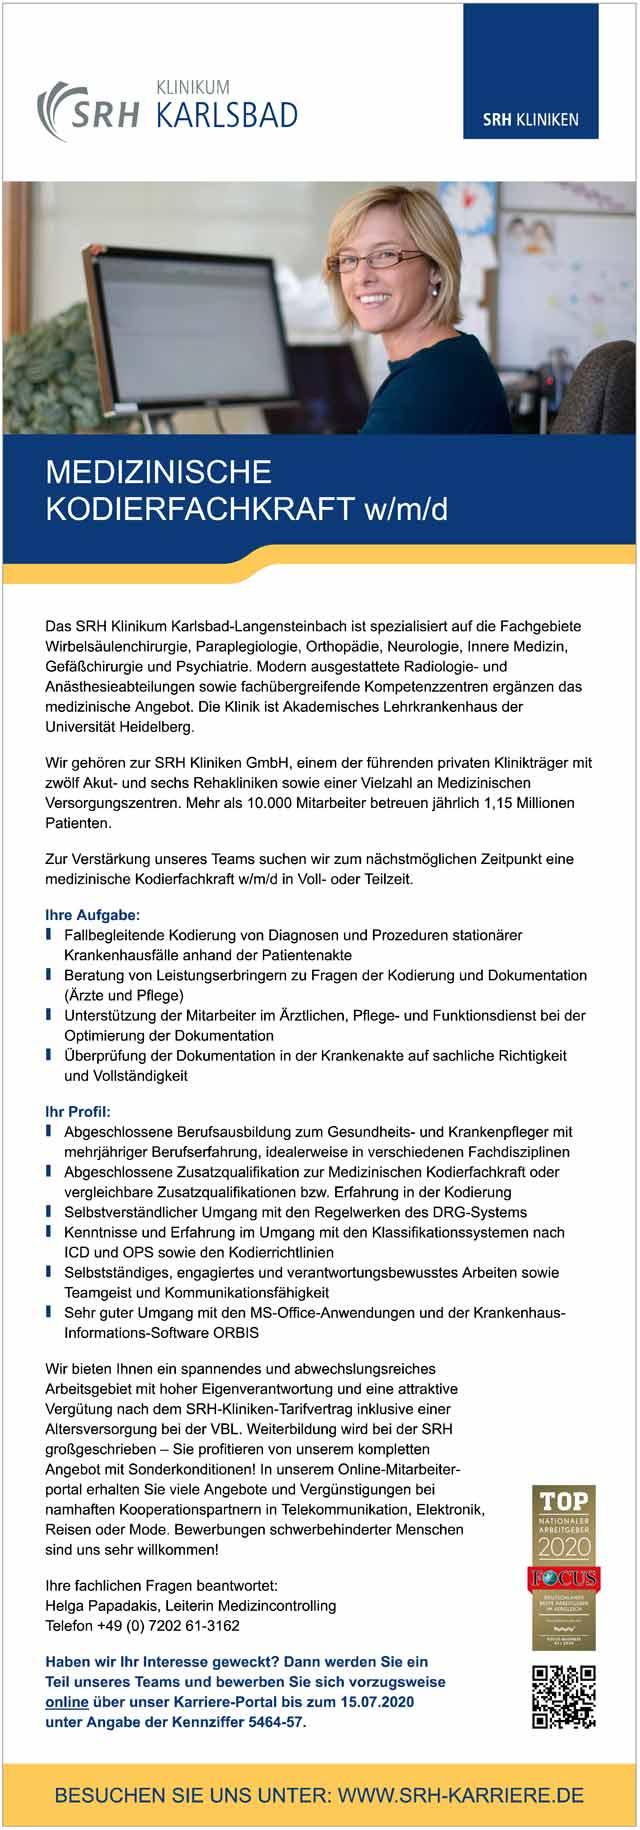 SRH Klinikum Karlsbad: Medizinische Kodierfachkraft (w/m/d)